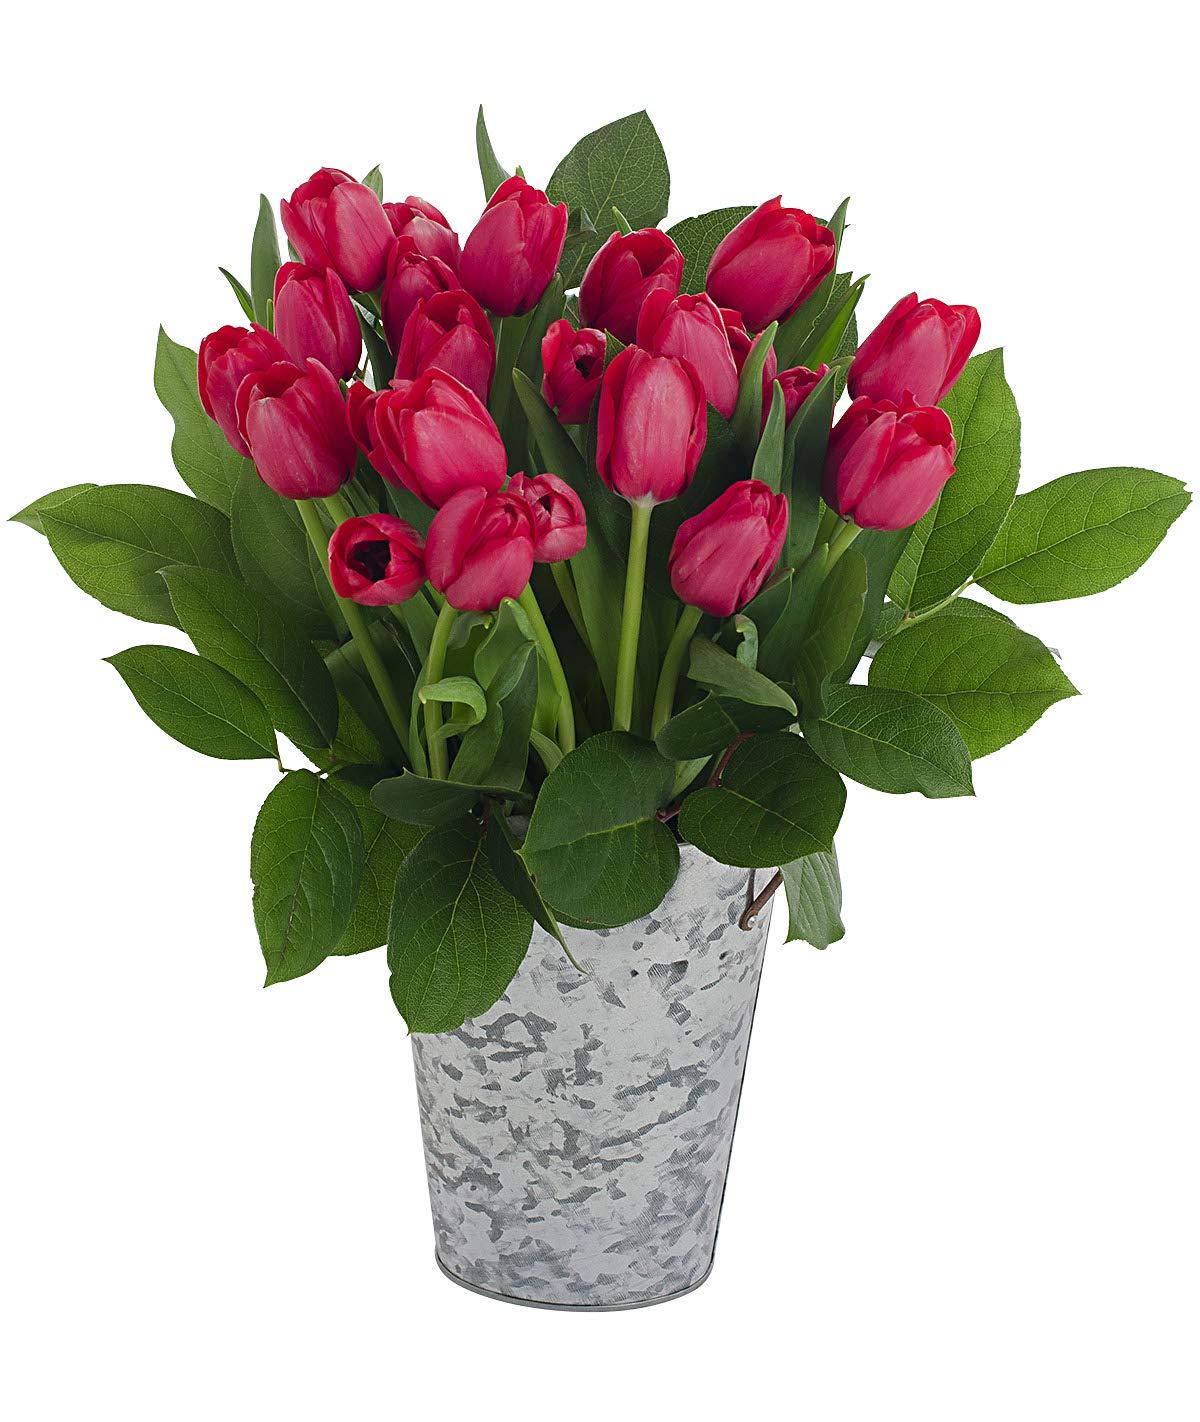 Stargazer Barn Passion Bouquet 2 Dozen Red Tulips with French Bucket Style Vase by Stargazer Barn